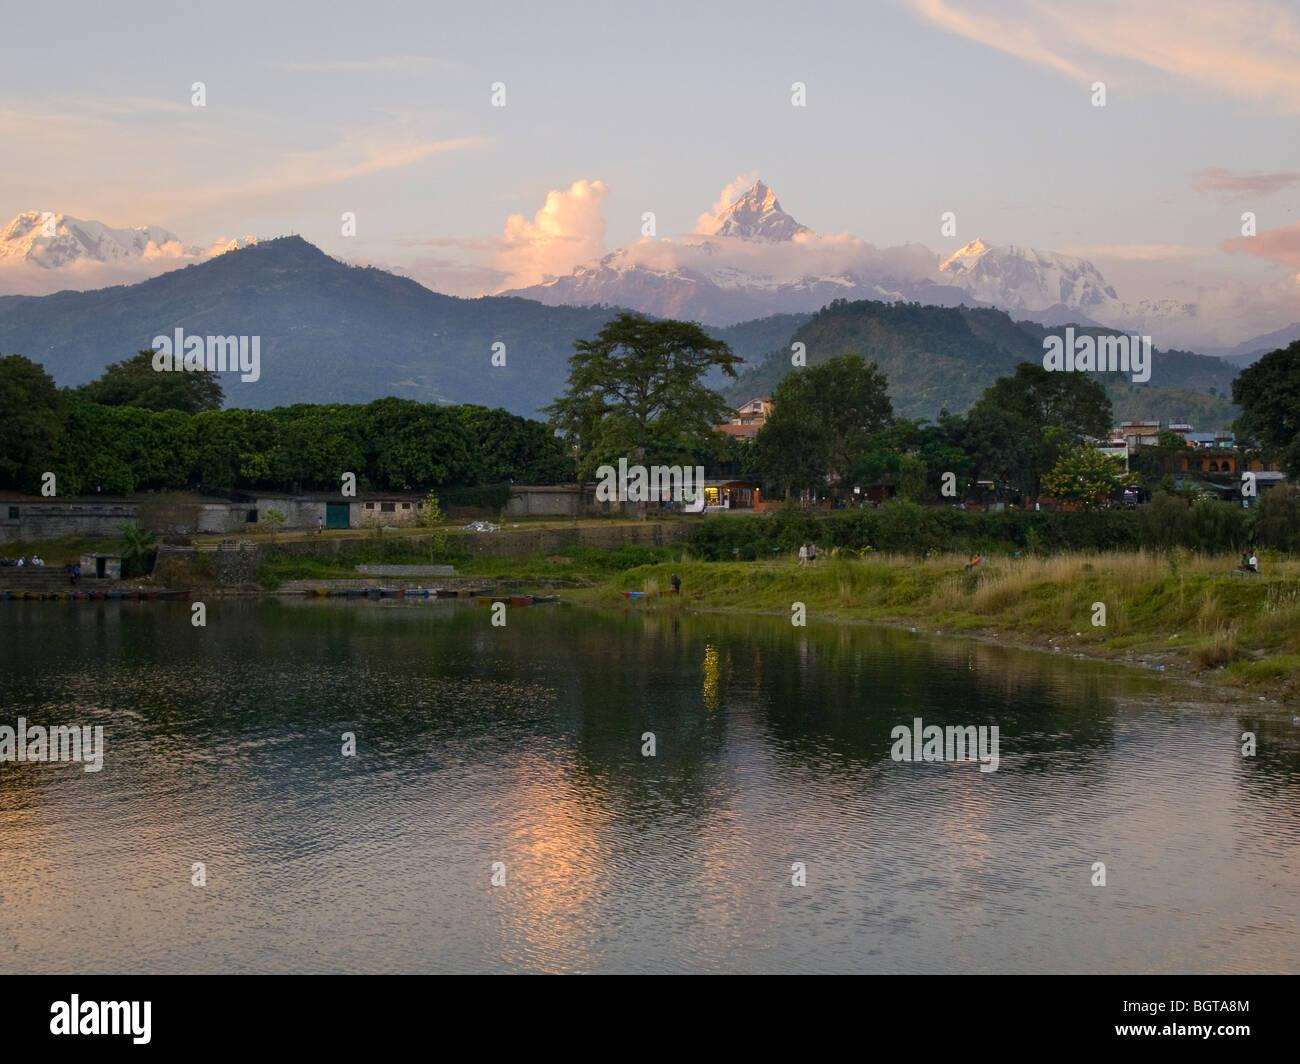 Machhapuchhare peak rising above Phewa lake and the town of Pokhara, Nepal. - Stock Image